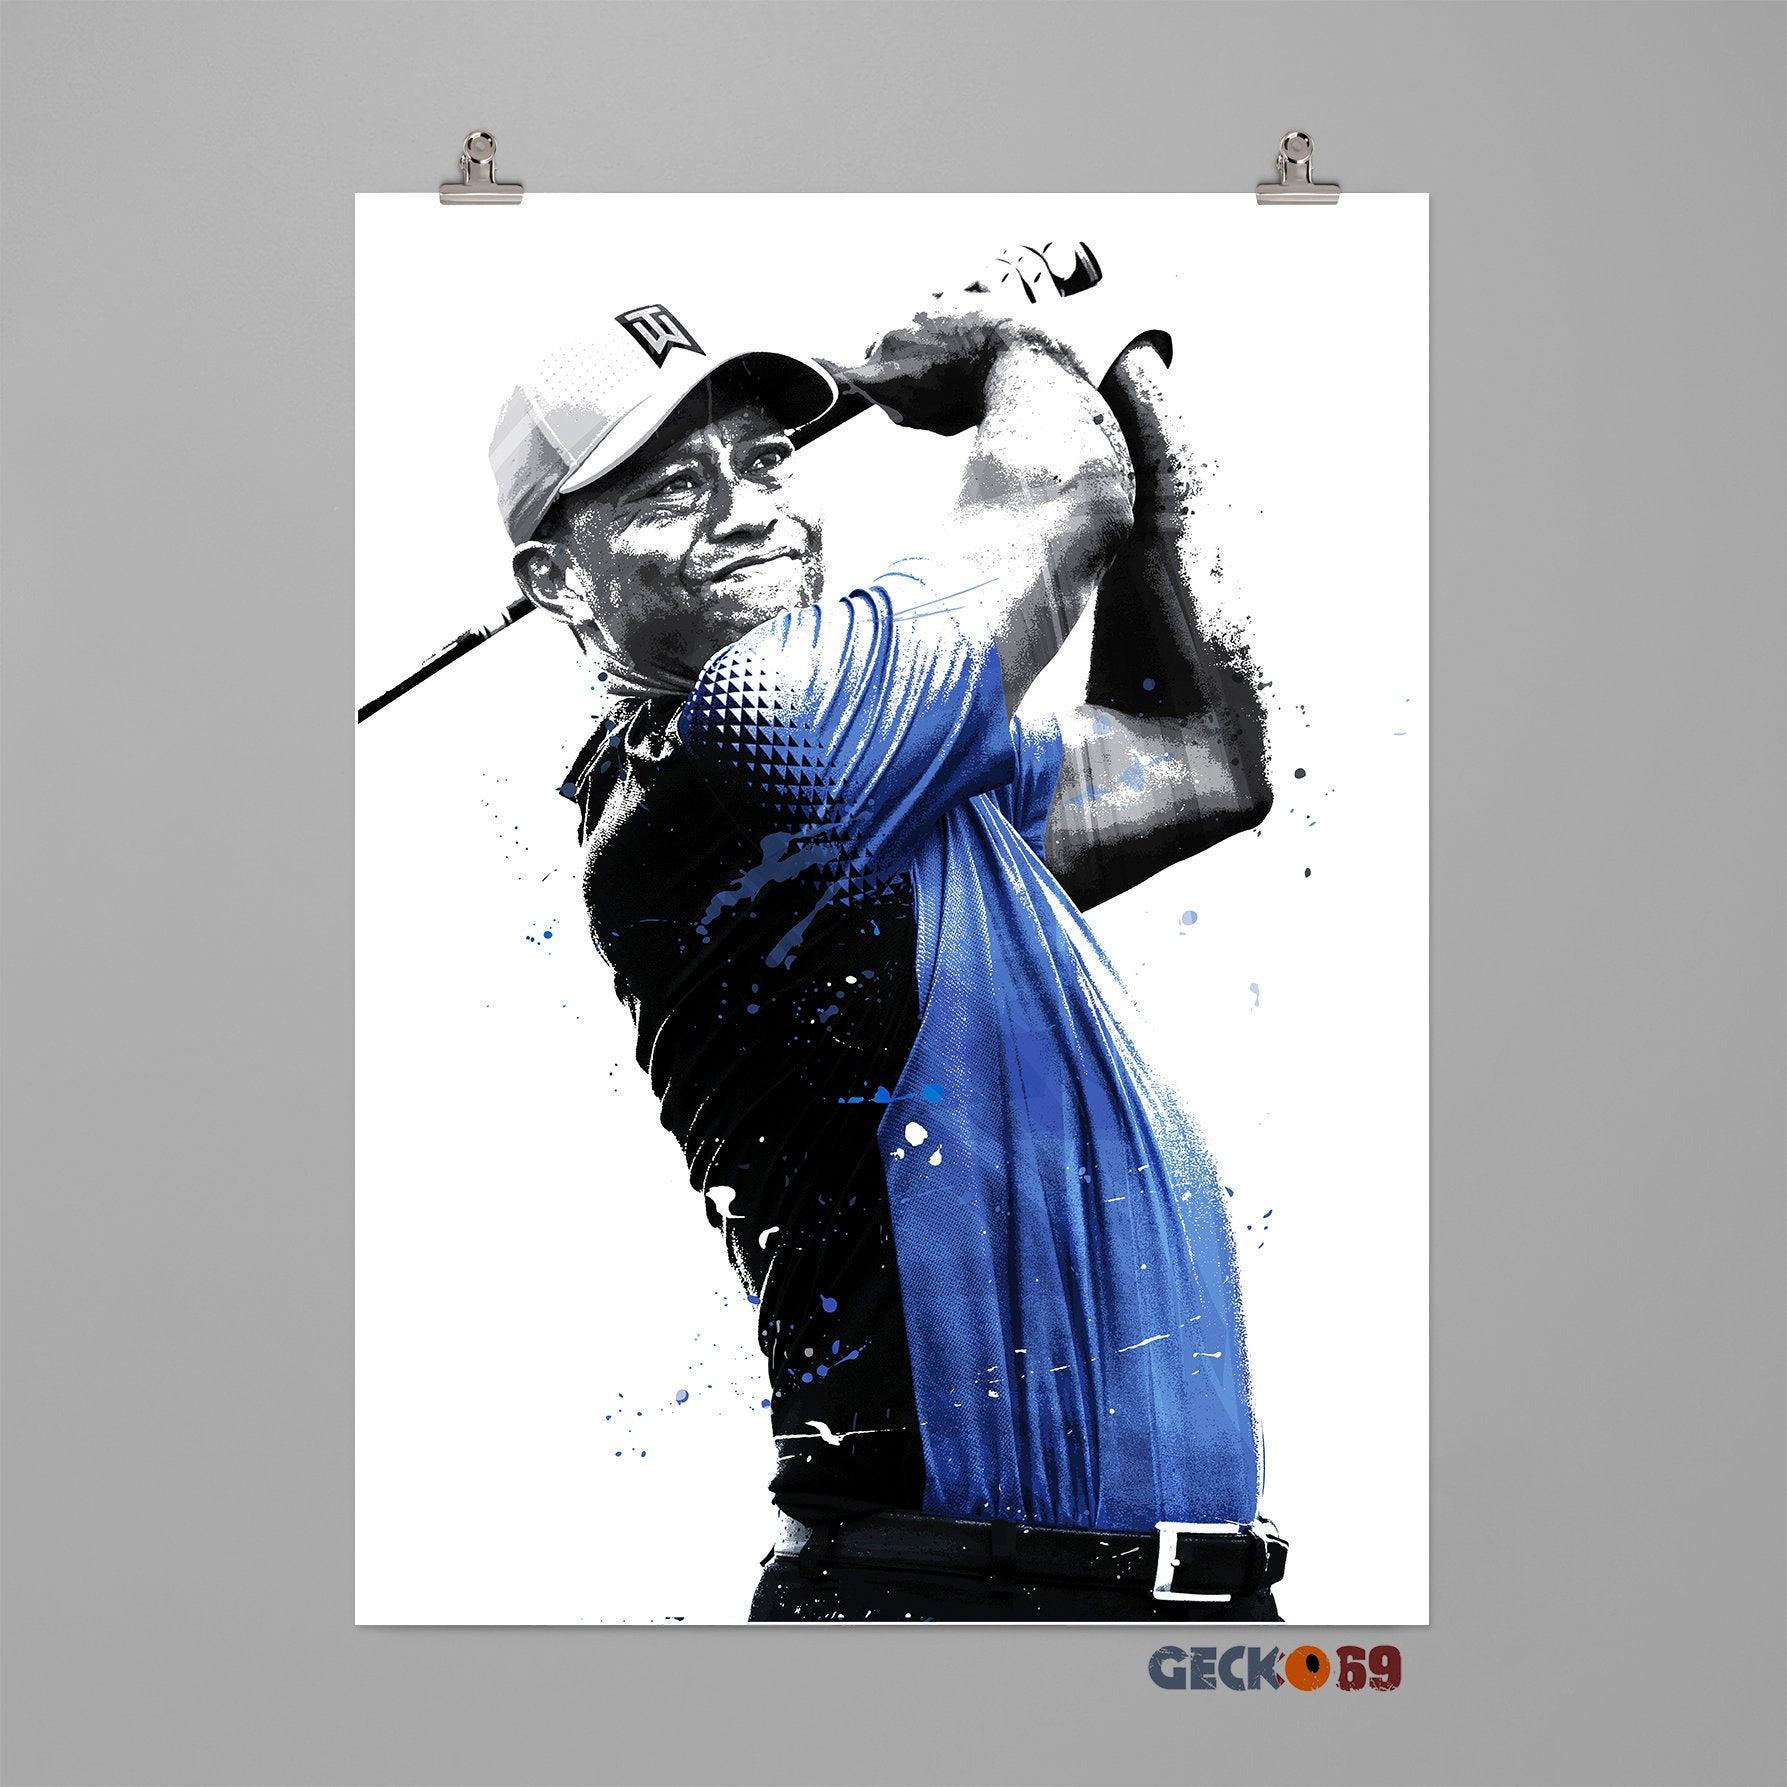 1787x1787 tiger woods poster golf poster print sports wall art dorm etsy